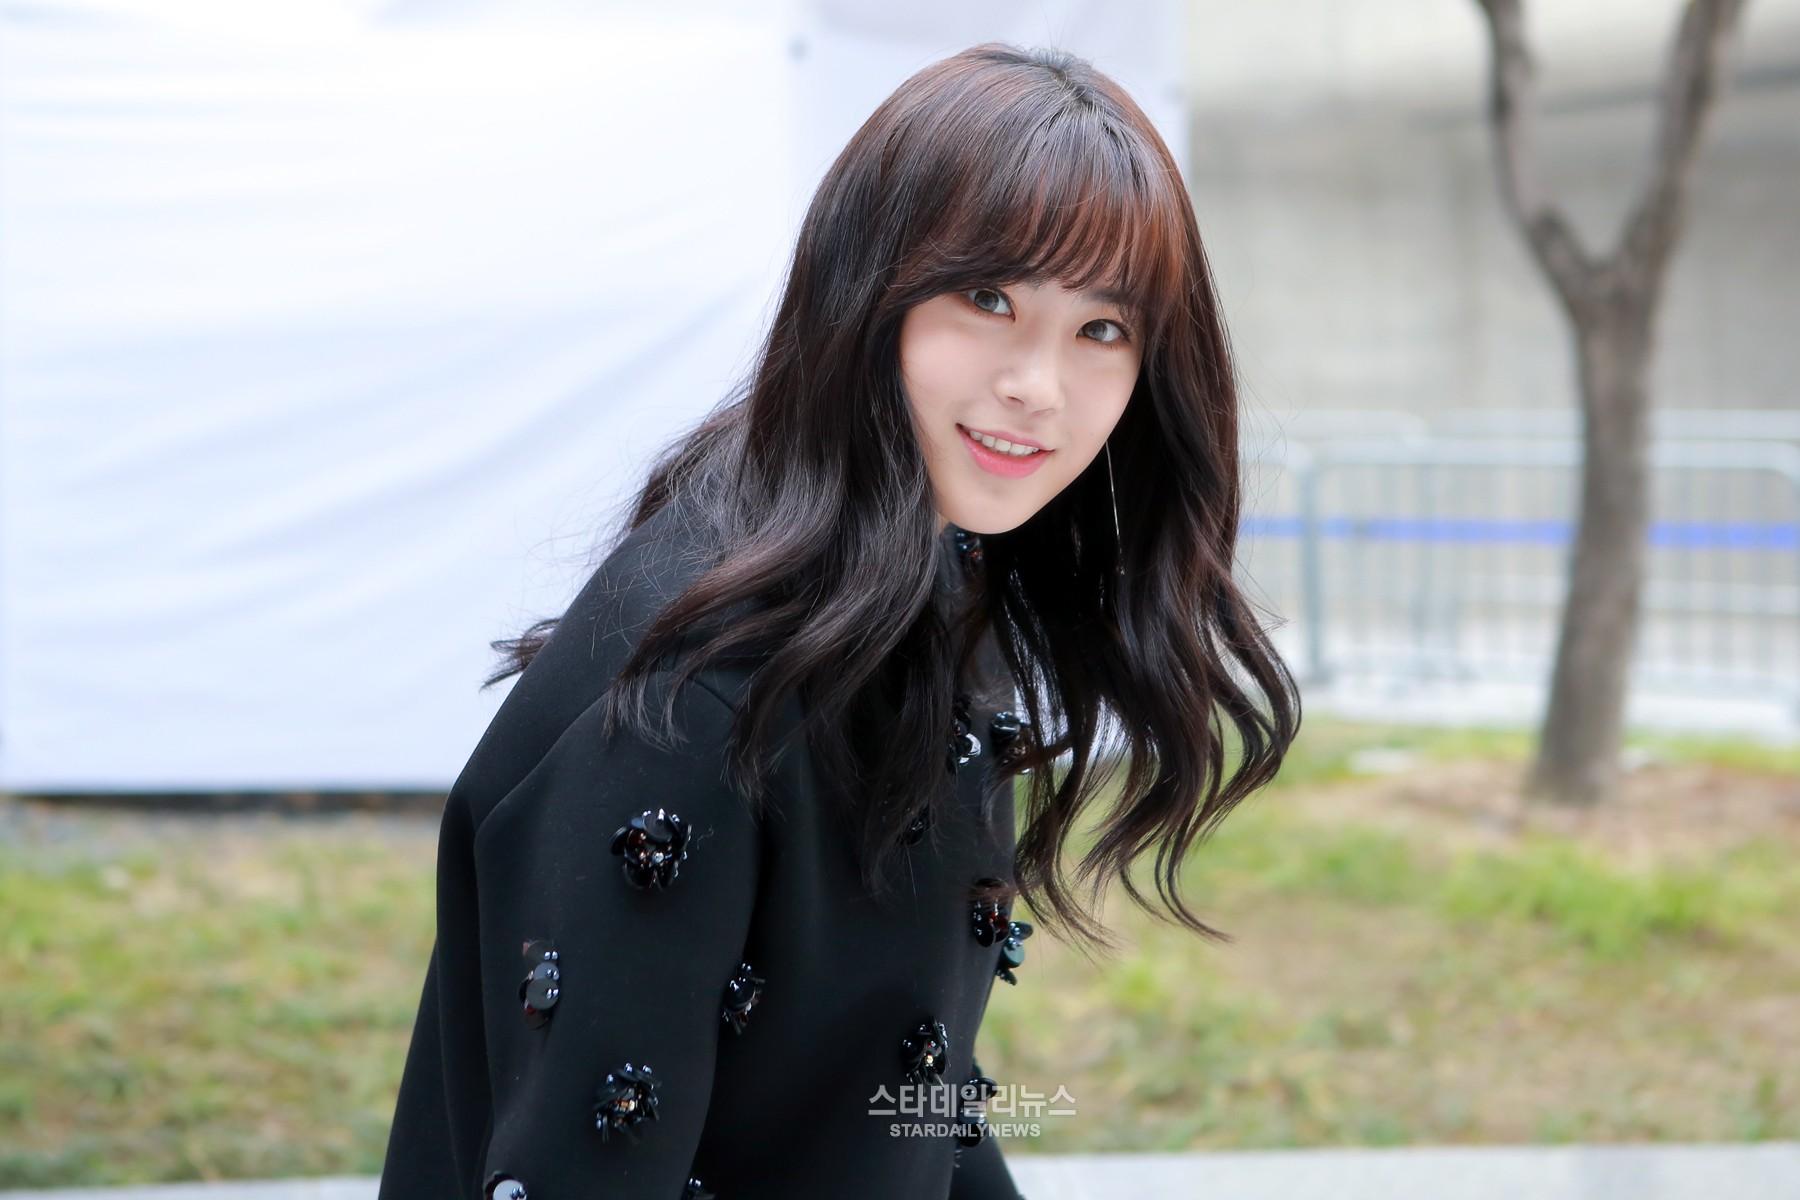 Heo Young-ji Byeol Korea